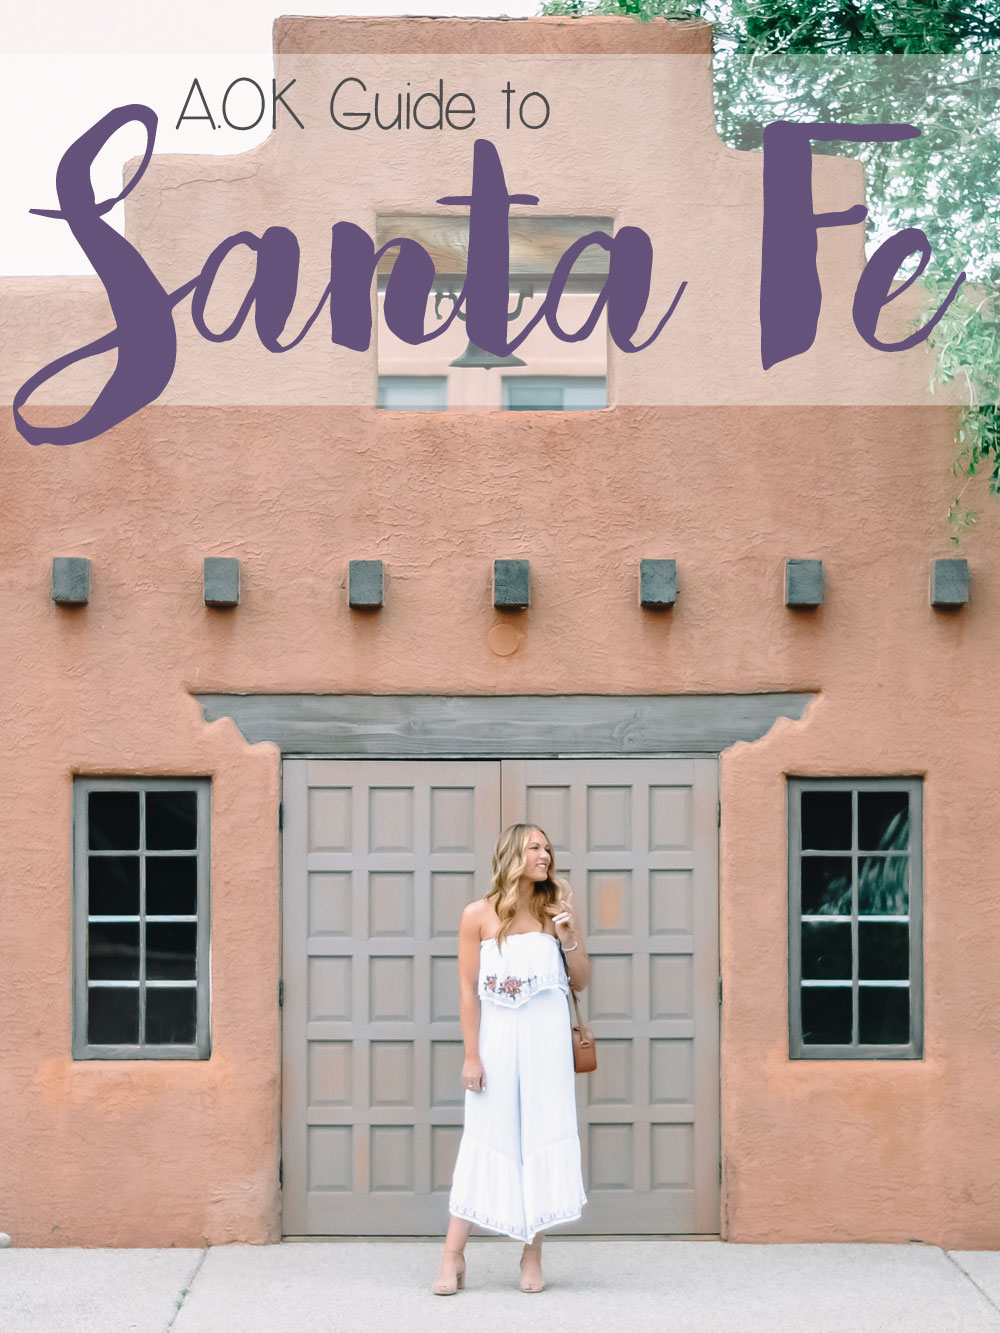 guide to santa fe